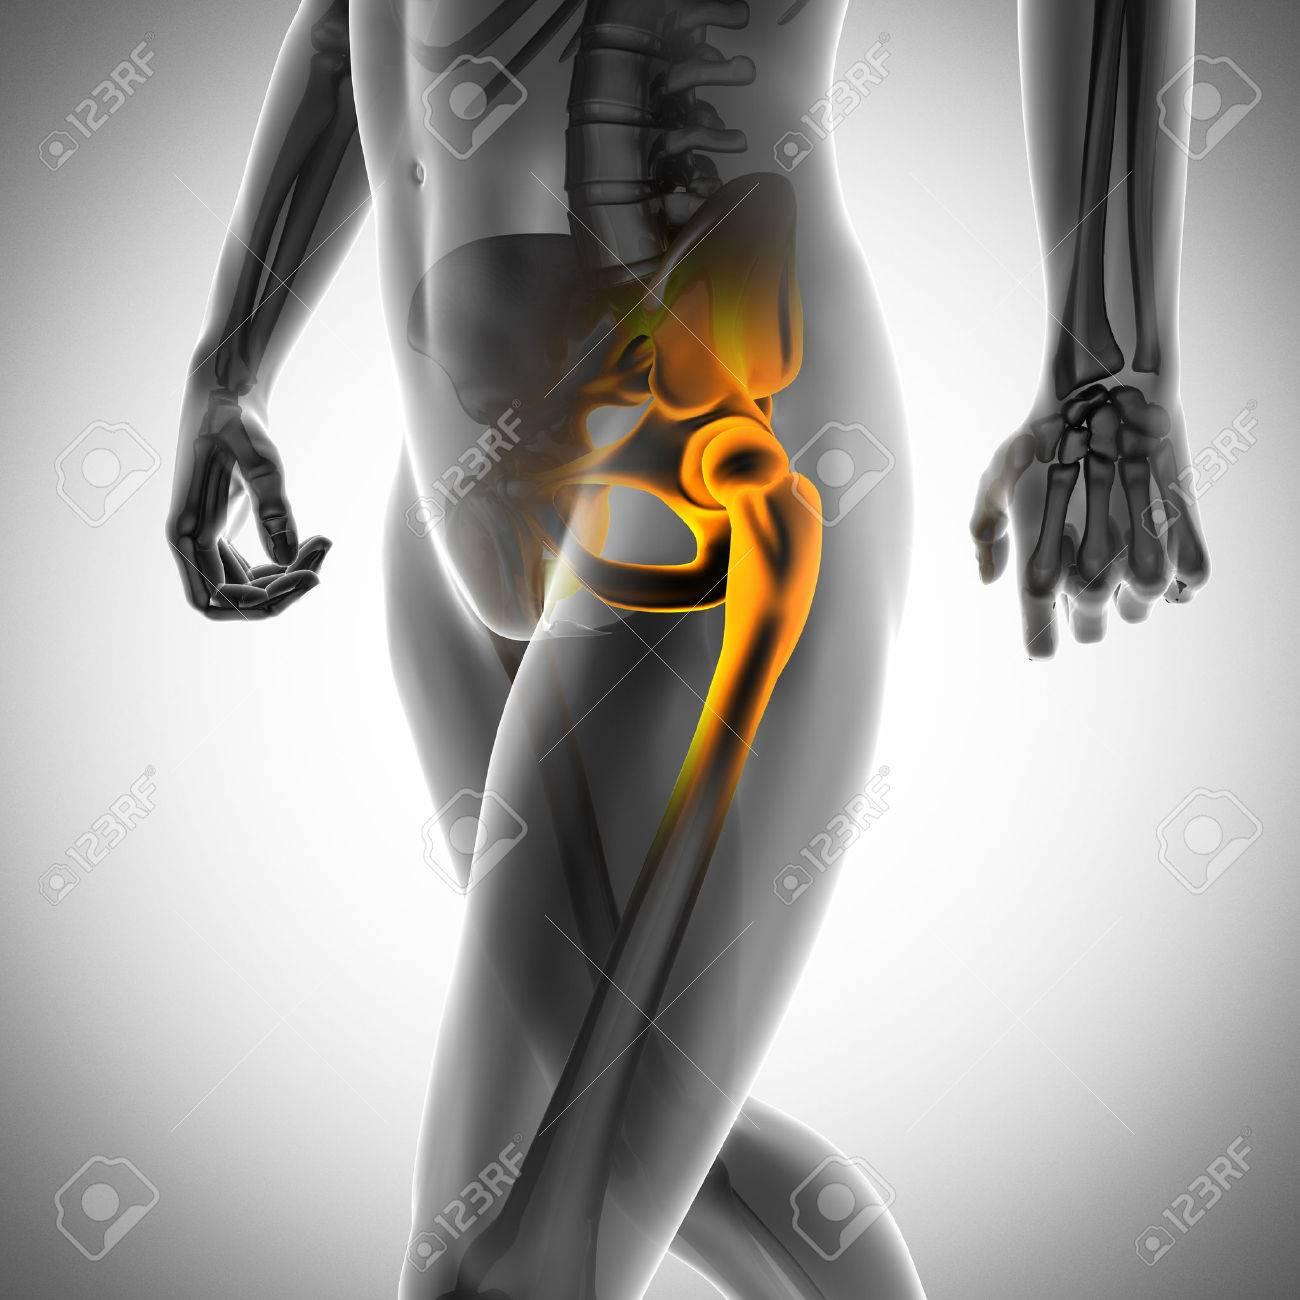 human bones radiography scan. x-ray image - 31178180